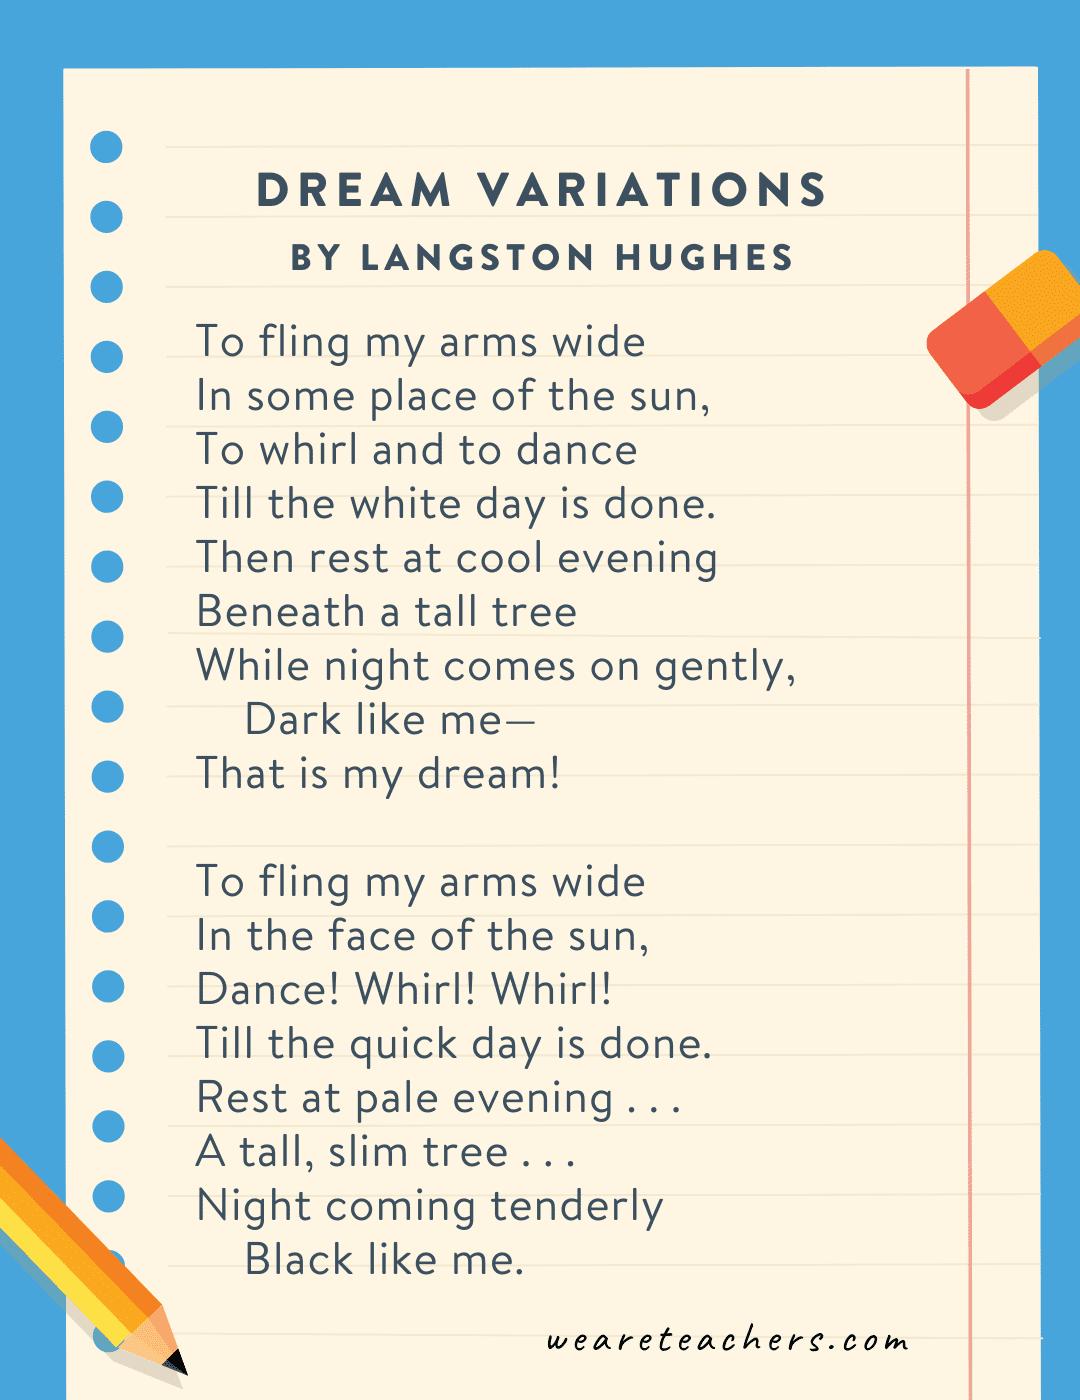 Dream Variations by Langston Hughes